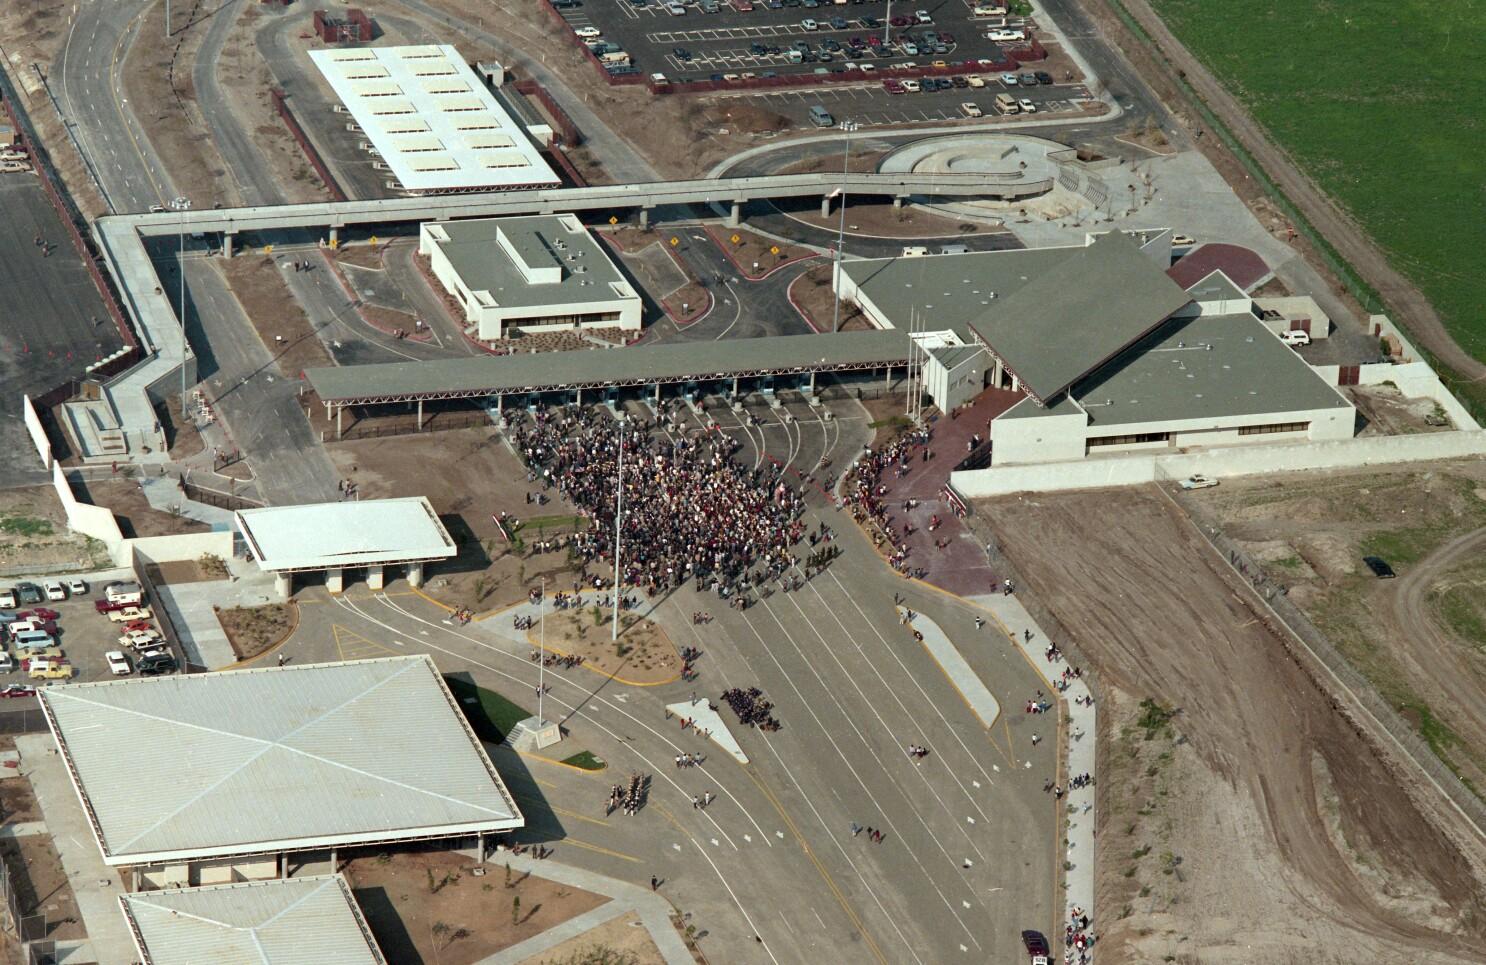 Otay Mesa border crossing opened 35 years ago